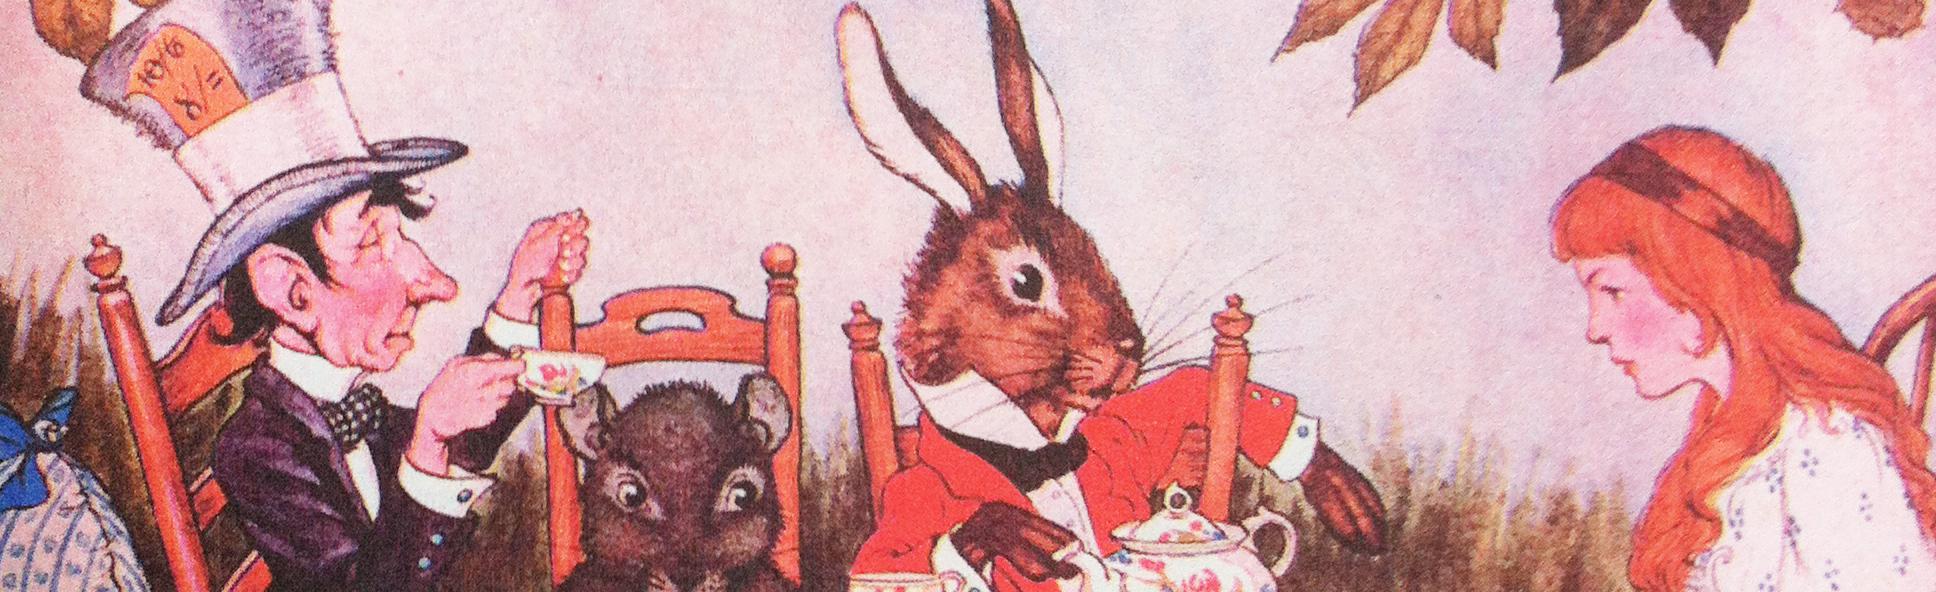 Illustrators of Alice's Wonderland